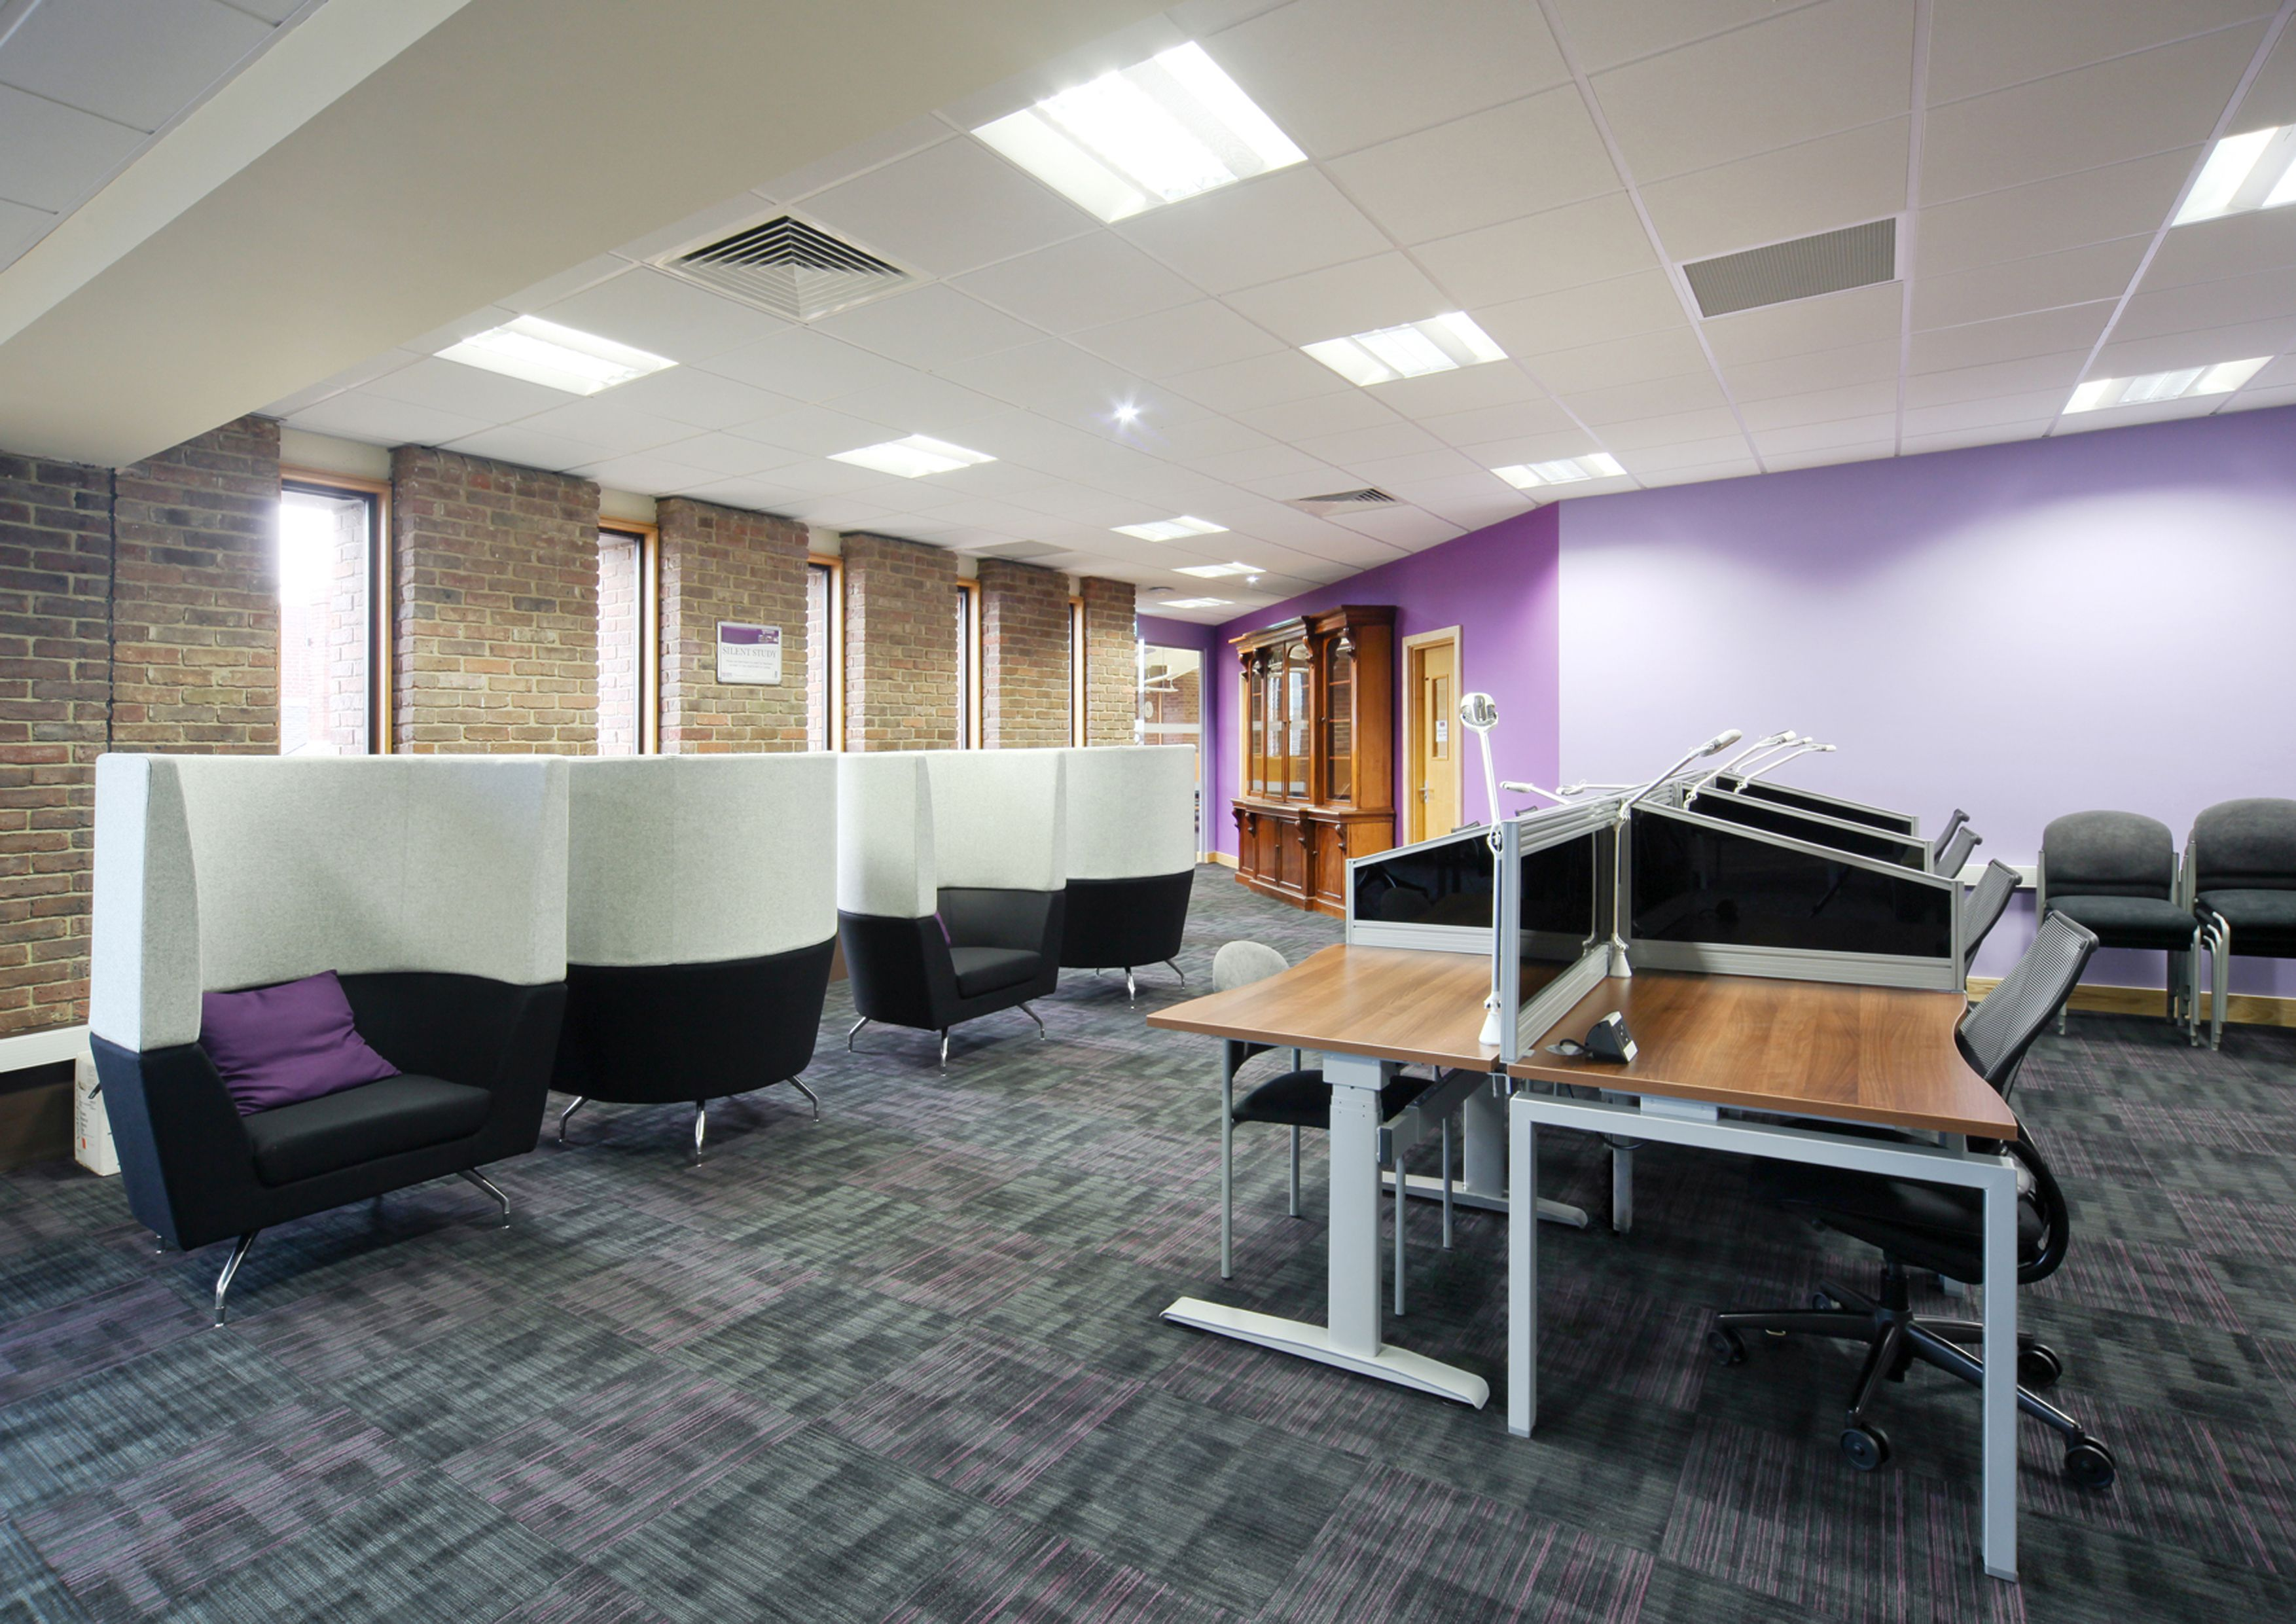 Robinson Library Newcastle University Case Study Broadstockcouk